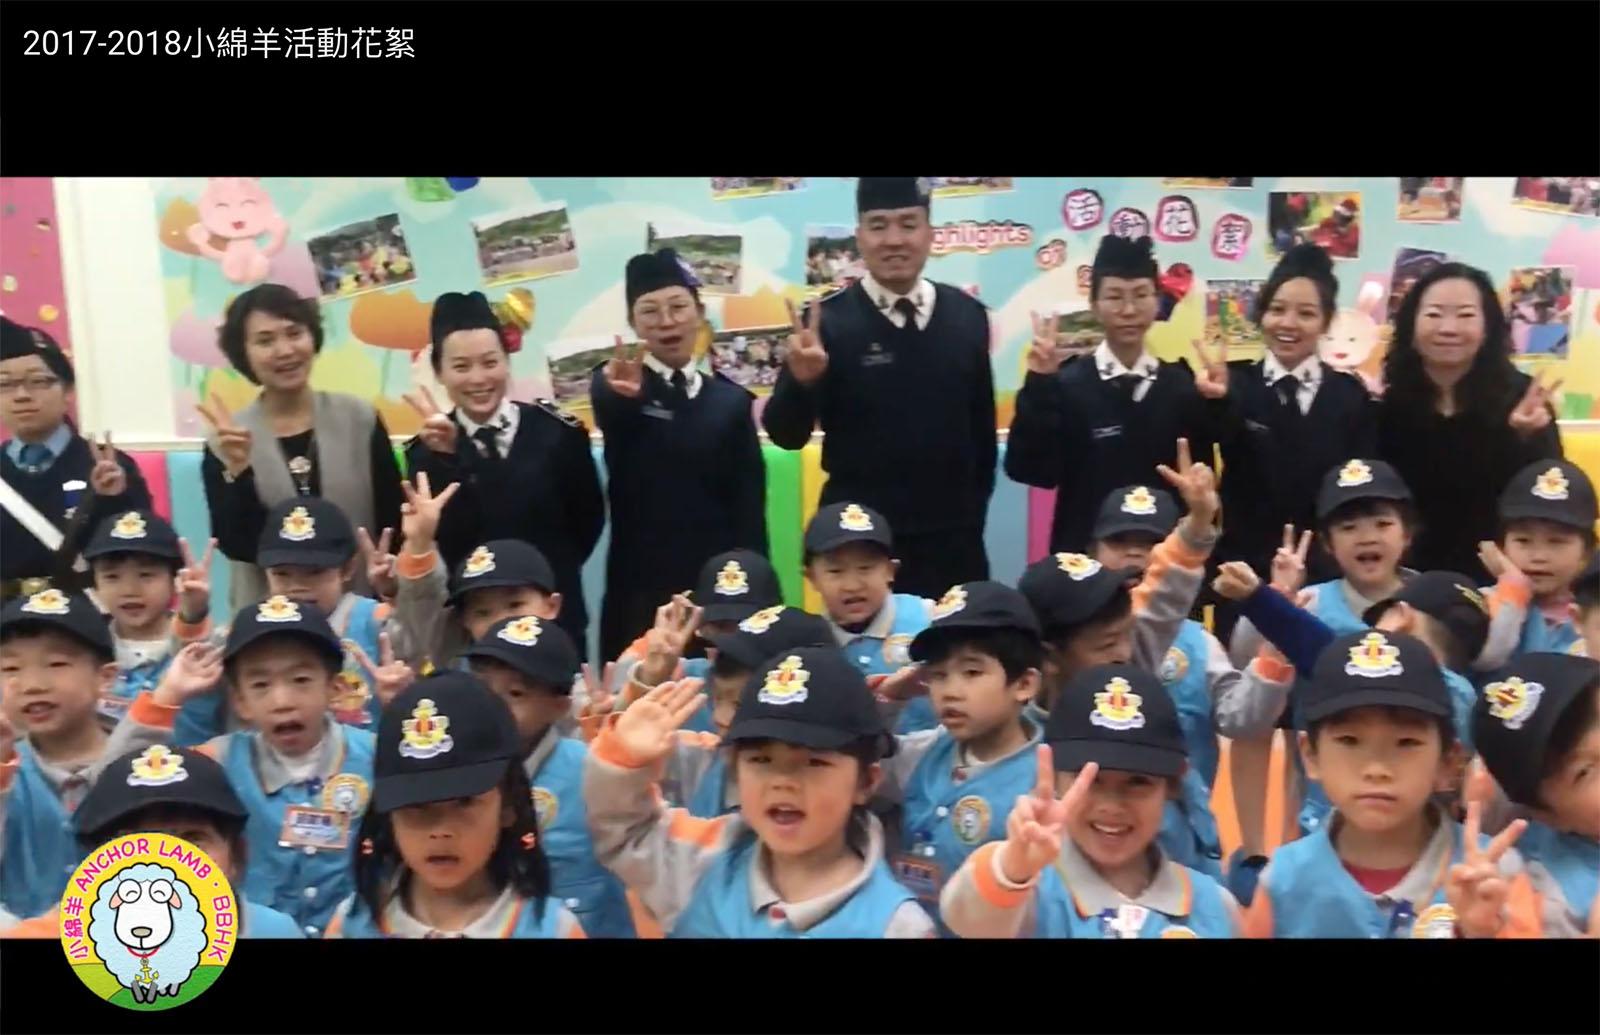 Photo of 【影片】2017-2018小綿羊活動花絮